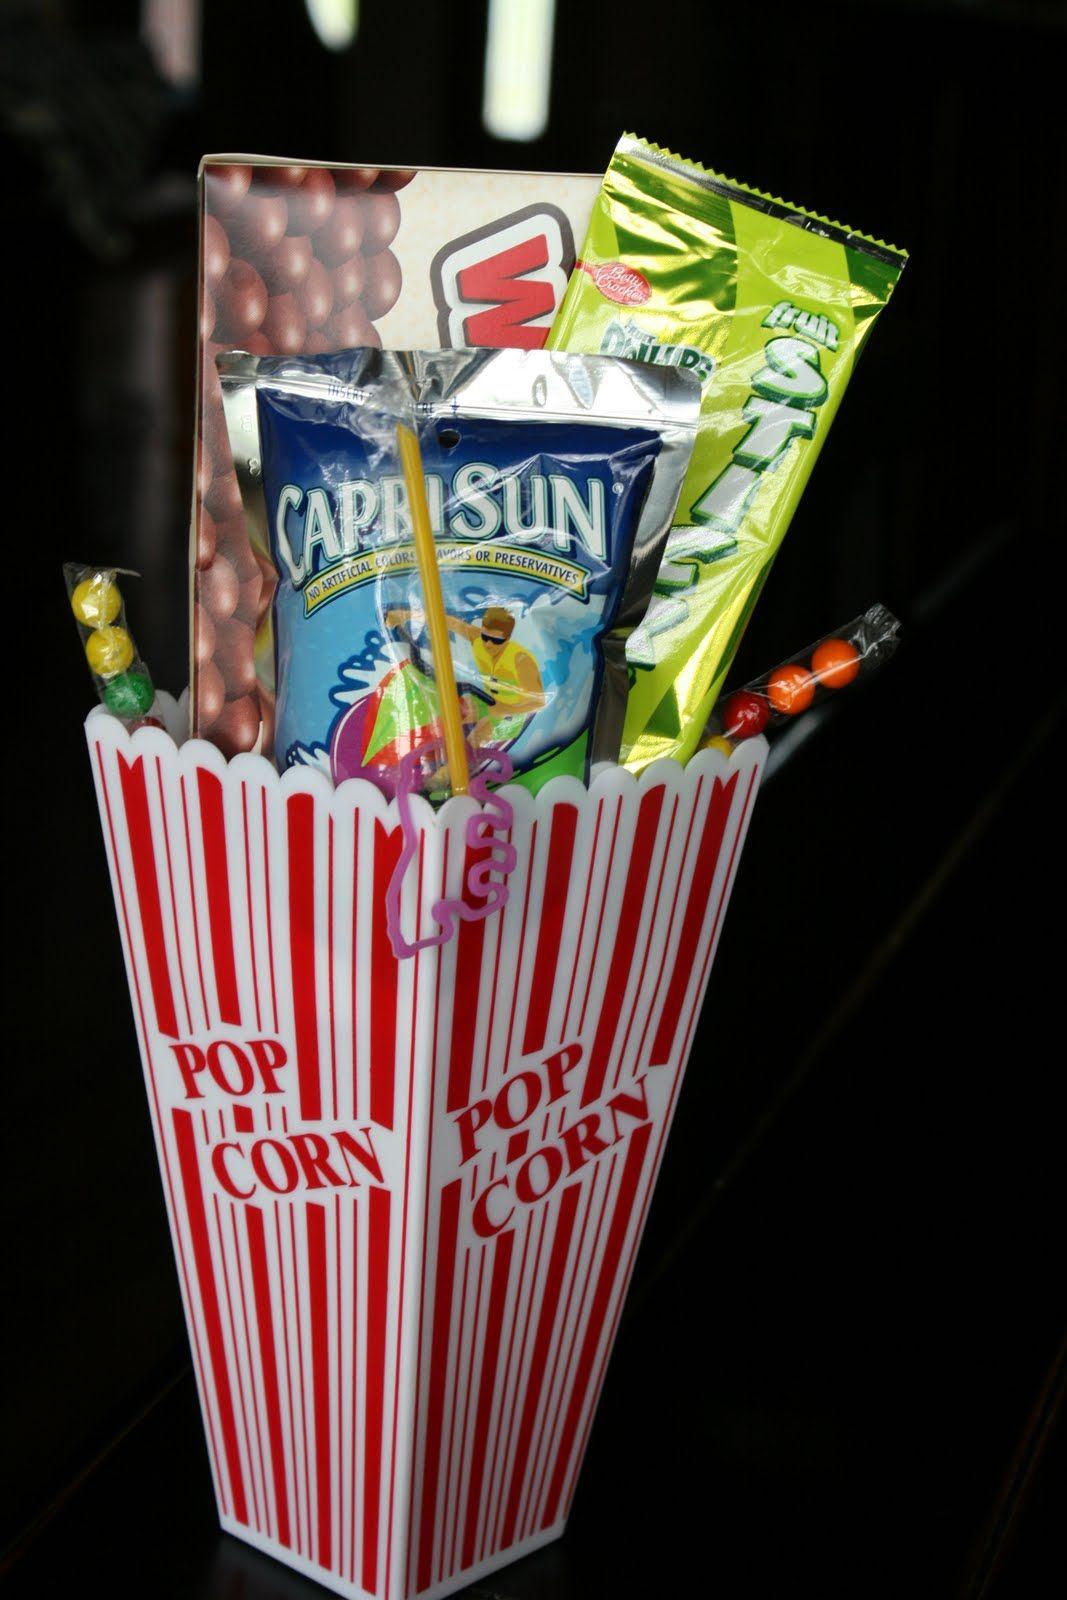 DriveIn slumber party movie snack idea! Cute idea for the